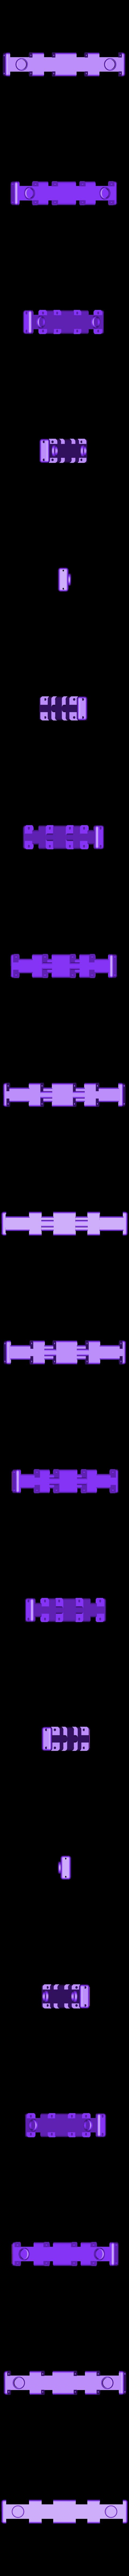 Book_spine.STL Download free STL file Blade of the Black Empire • 3D printer model, Rusichar